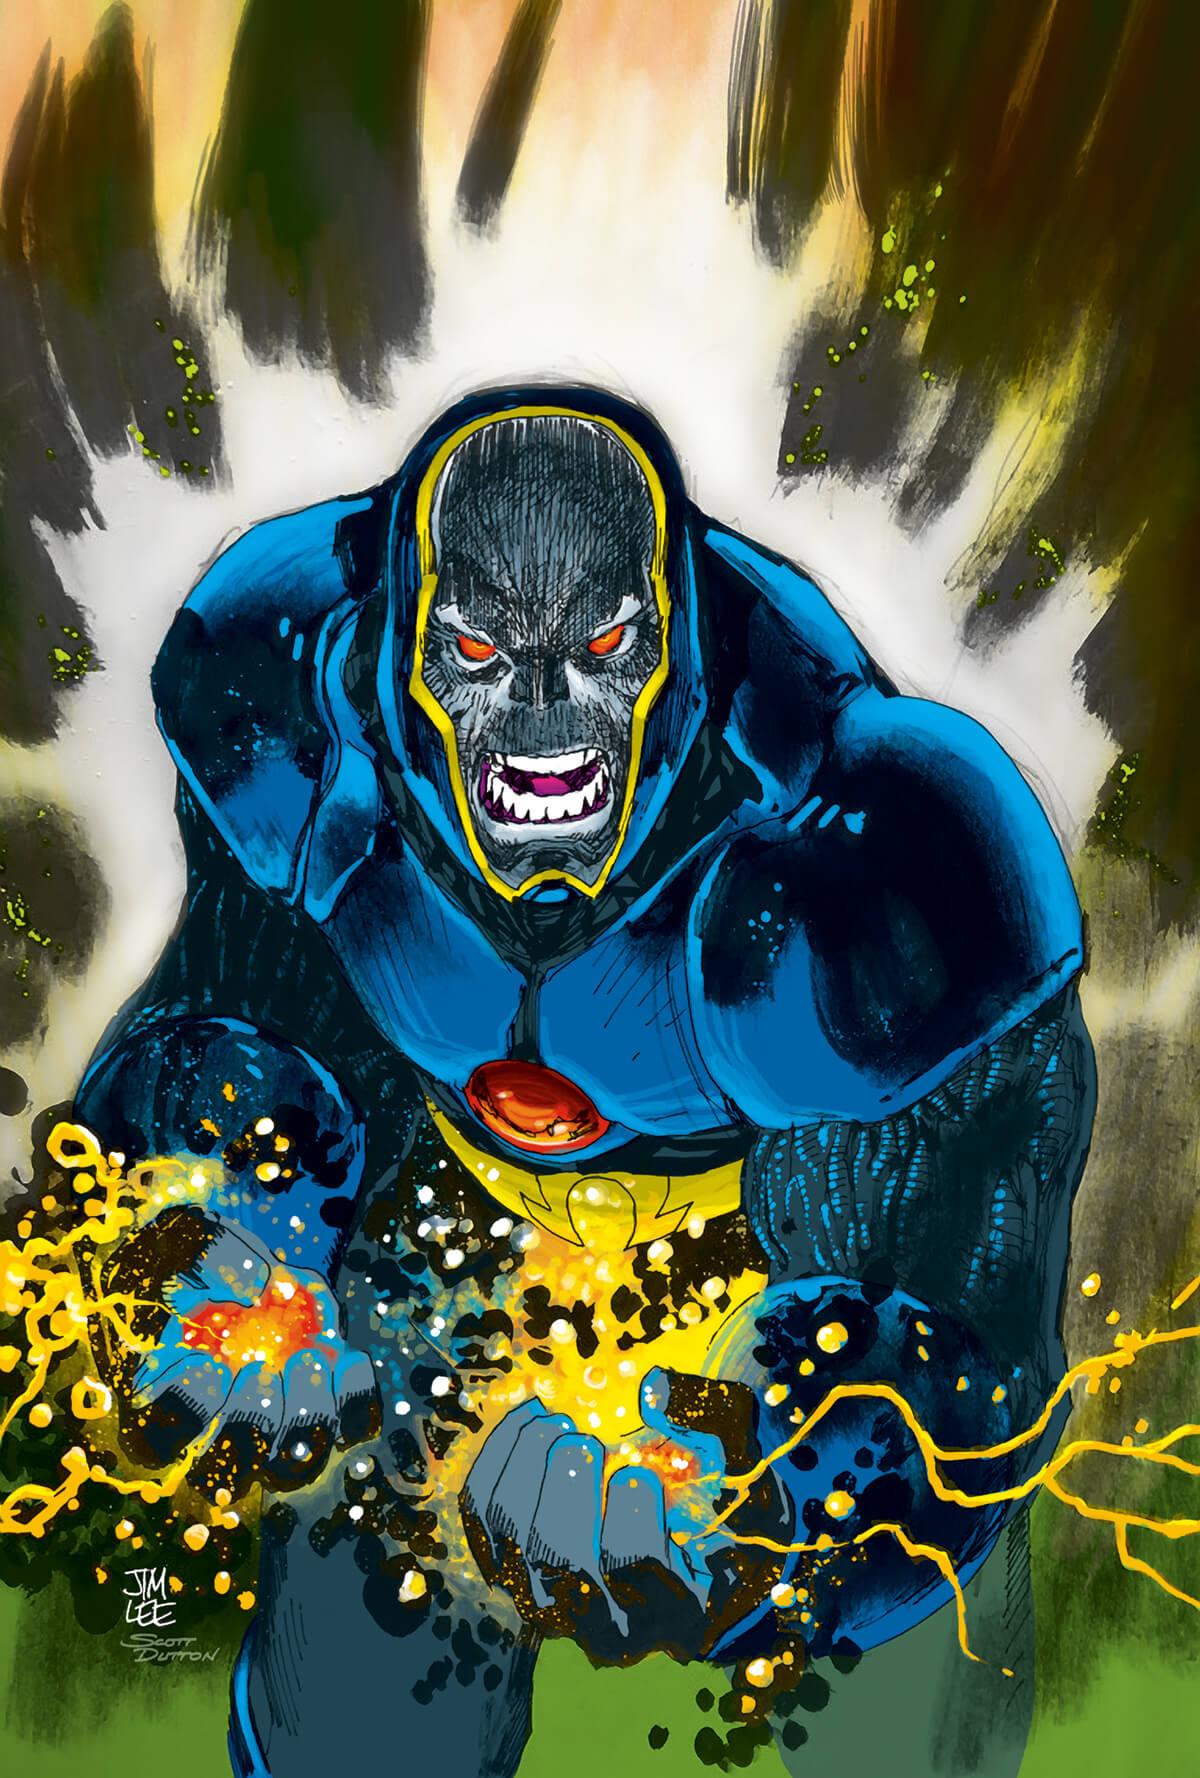 Comic book colouring by Scott Dutton